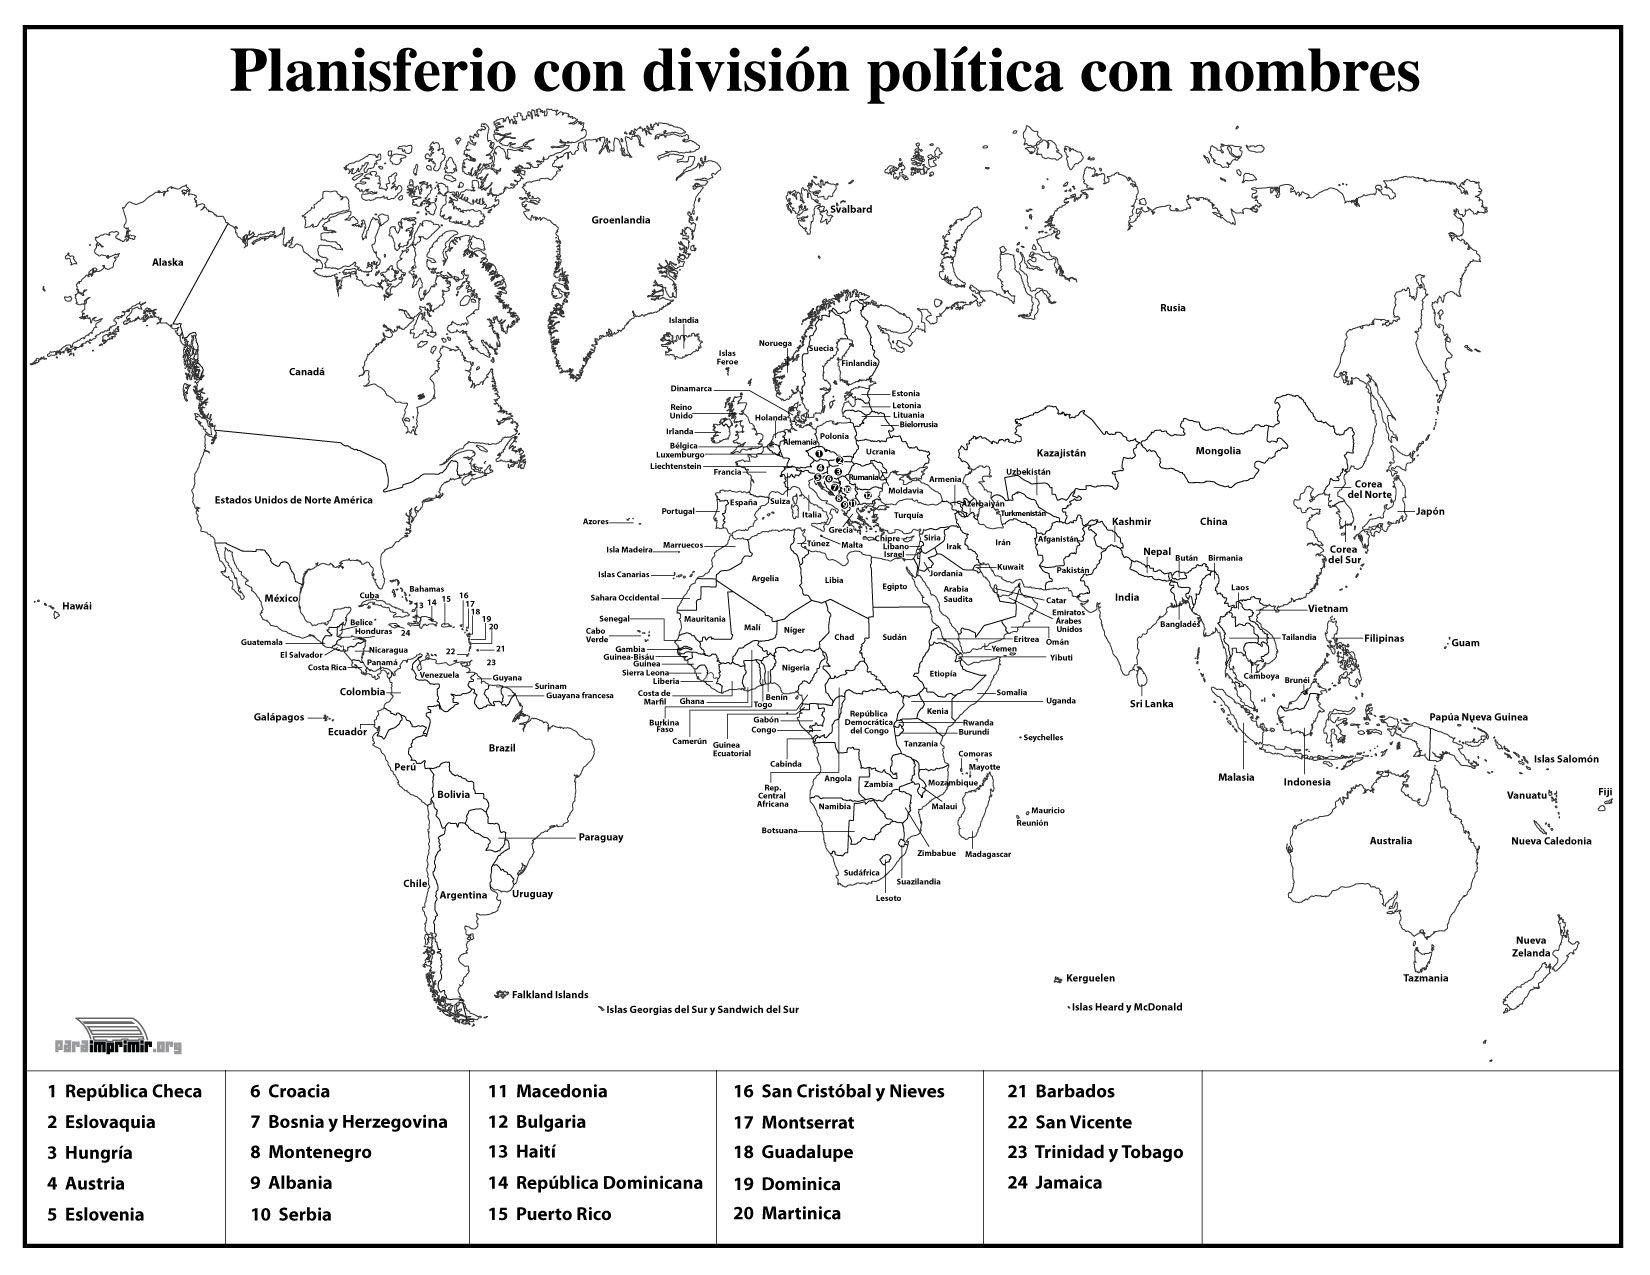 Mapamundi Con División Política Con Nombres Para Imprimir - Mapa ...